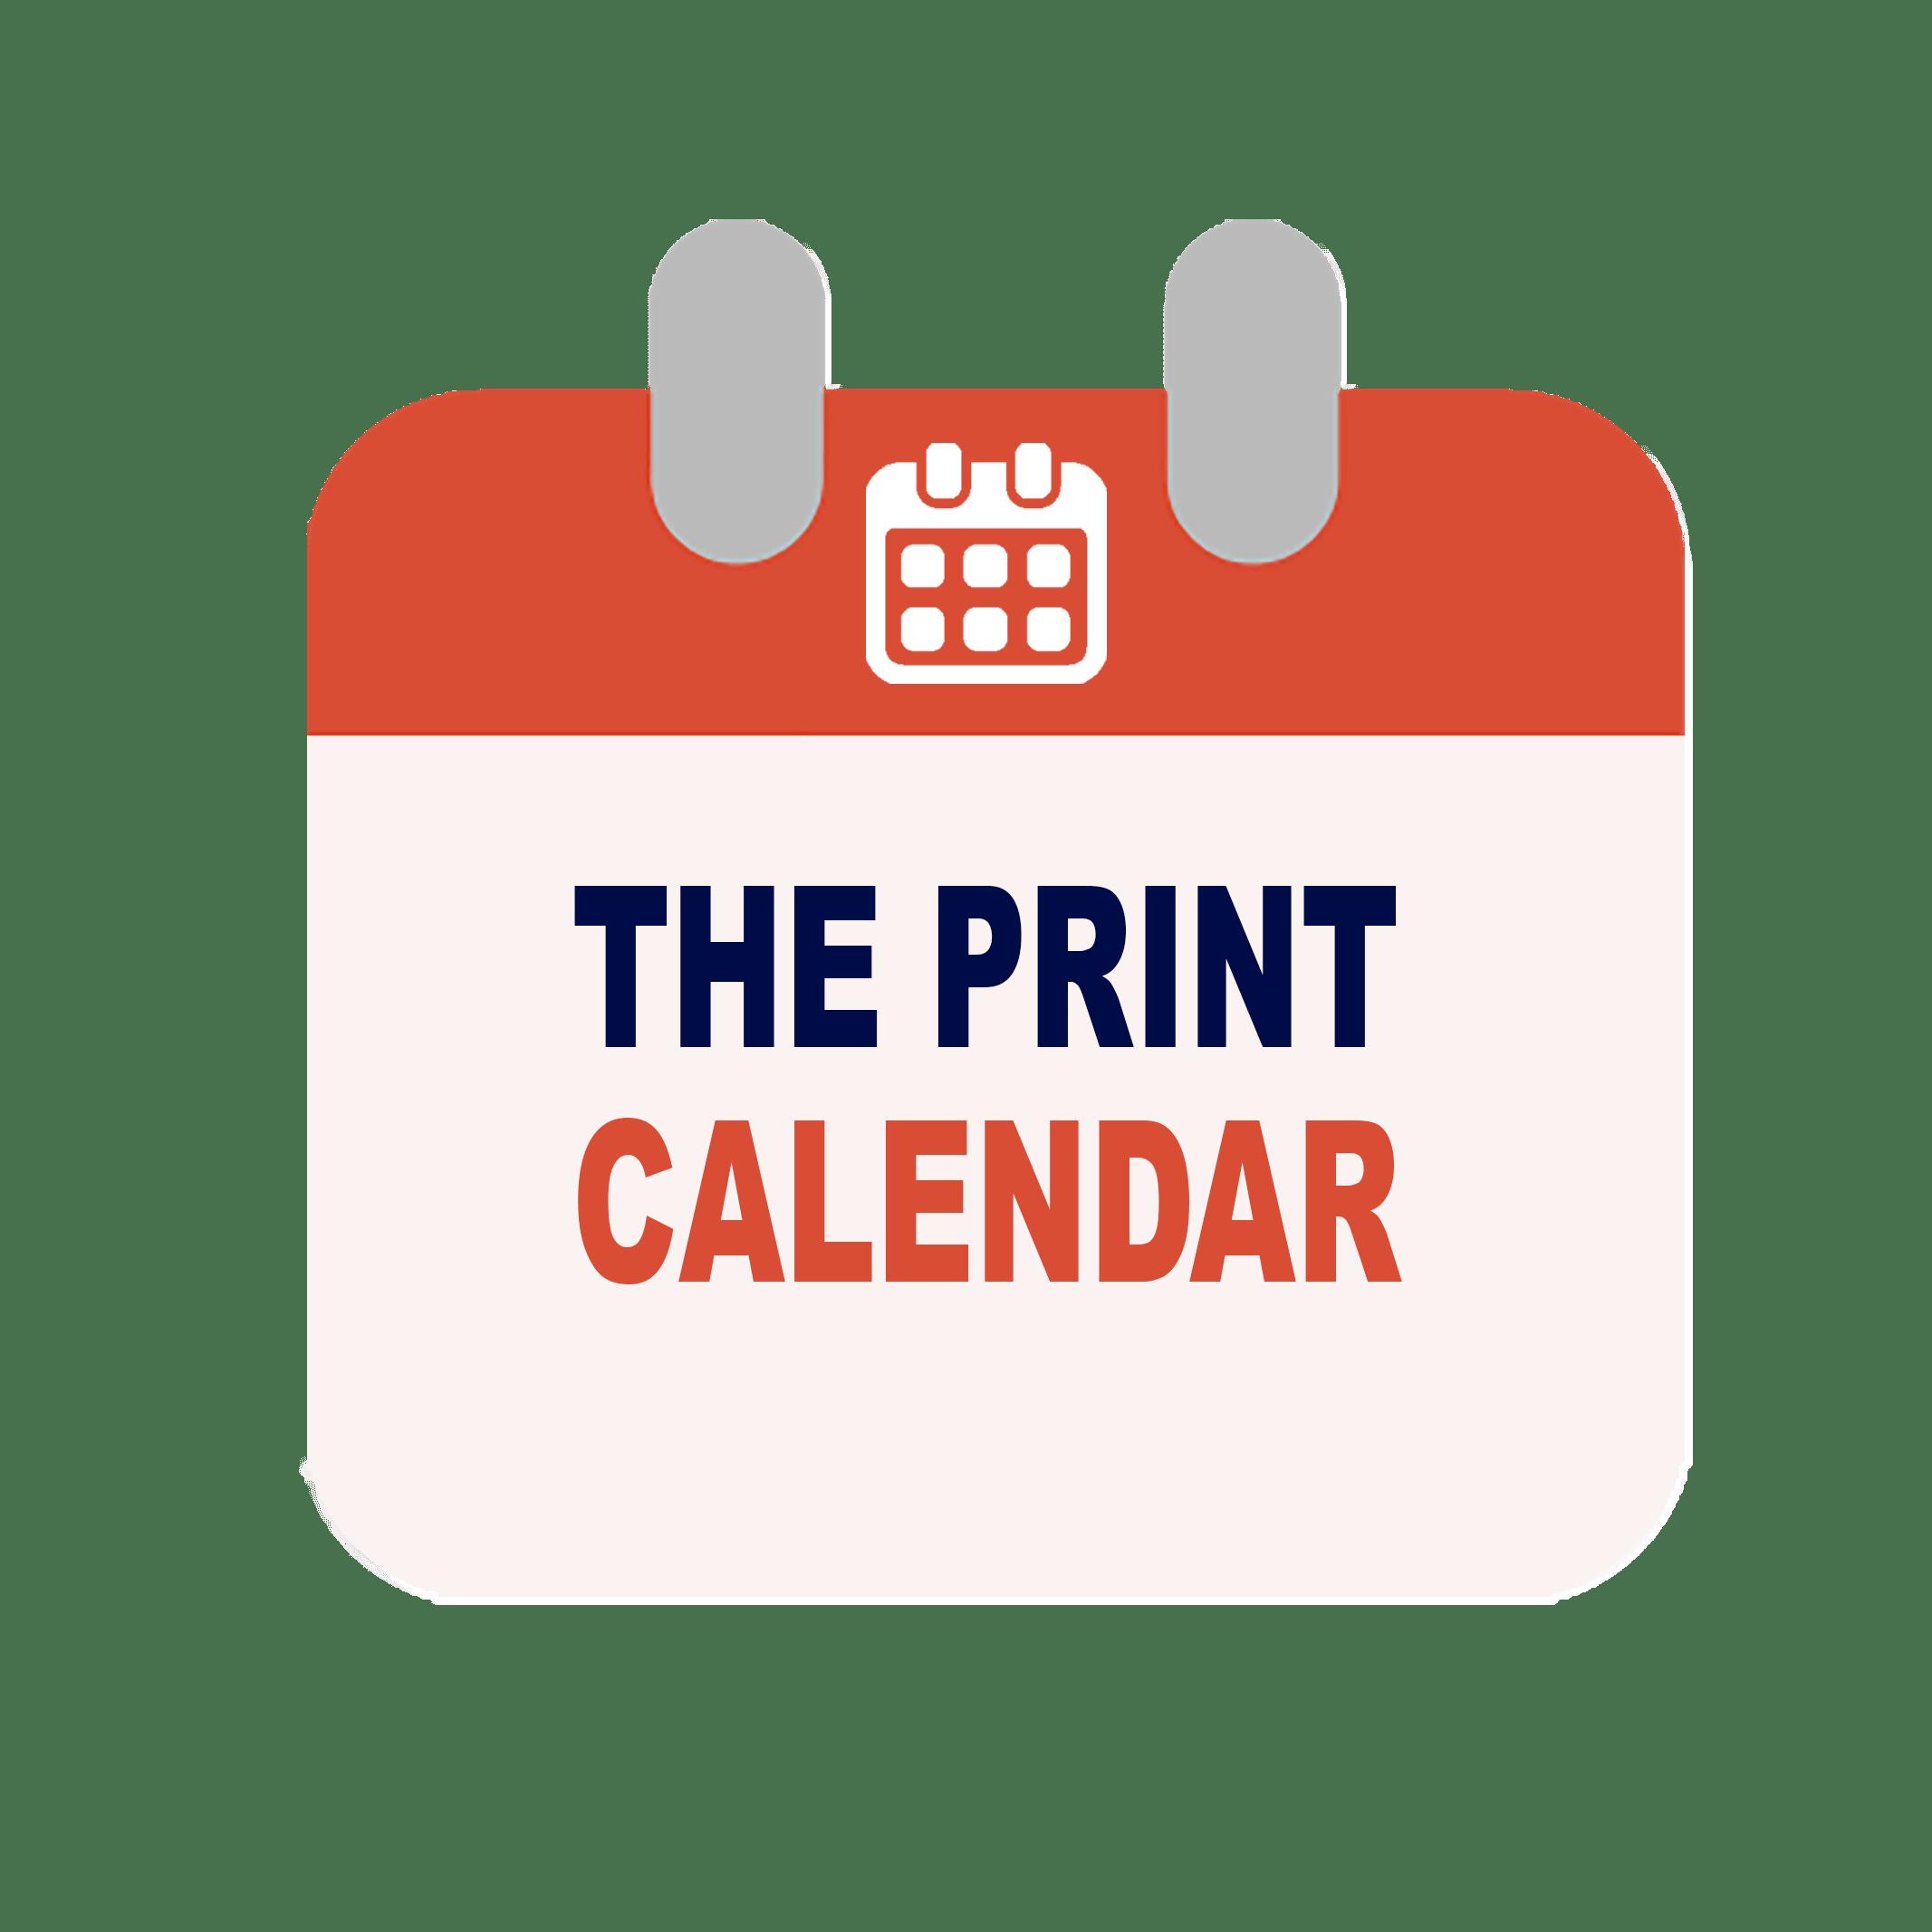 Print the calendar logo